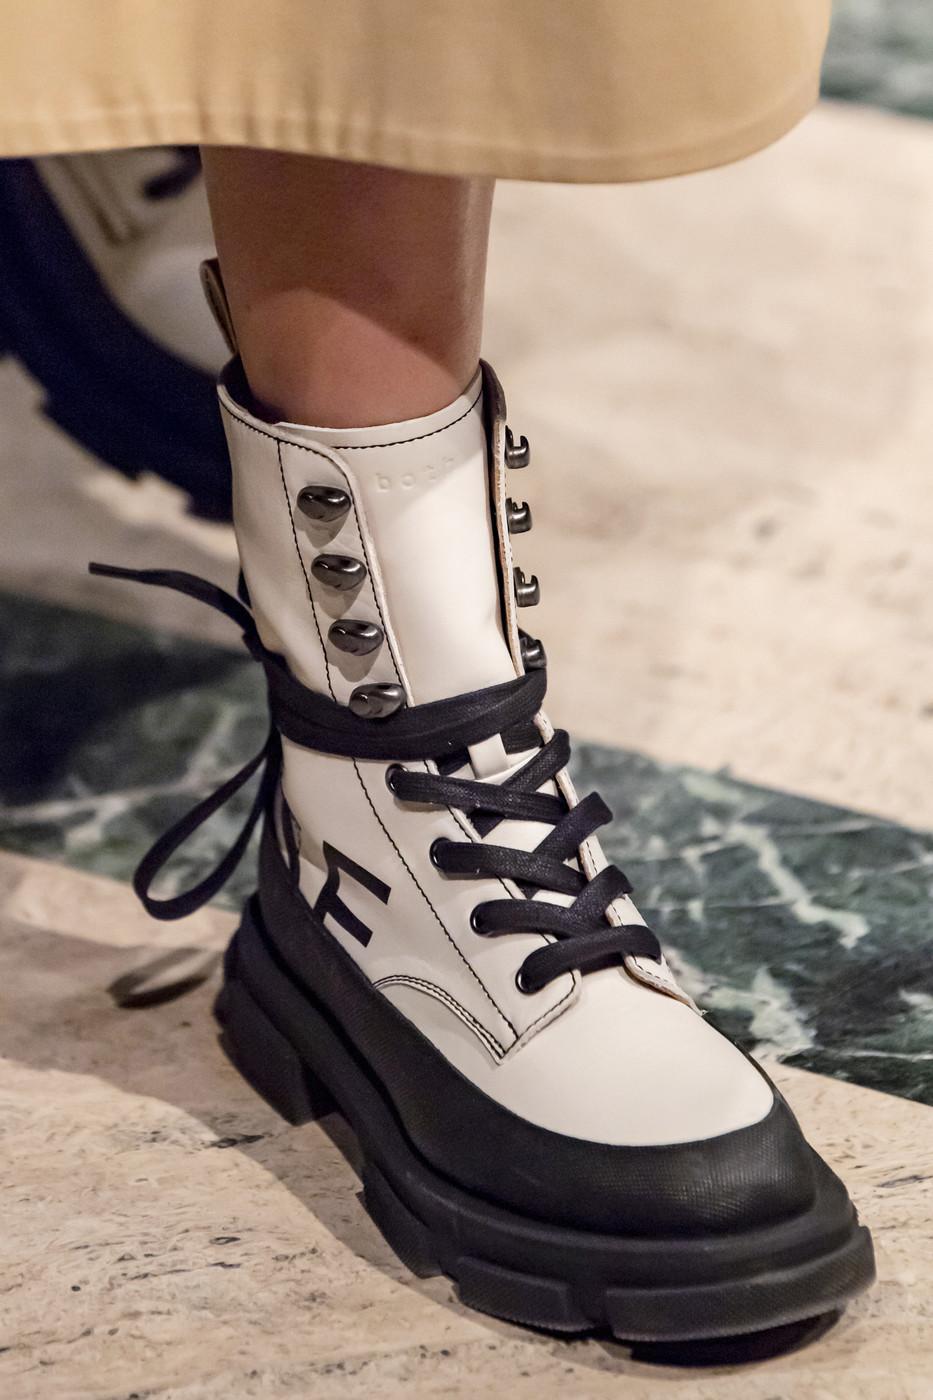 Monse At New York Fashion Week Fall 2020 Shoes Fashion Photography Fashion Shoes Boots